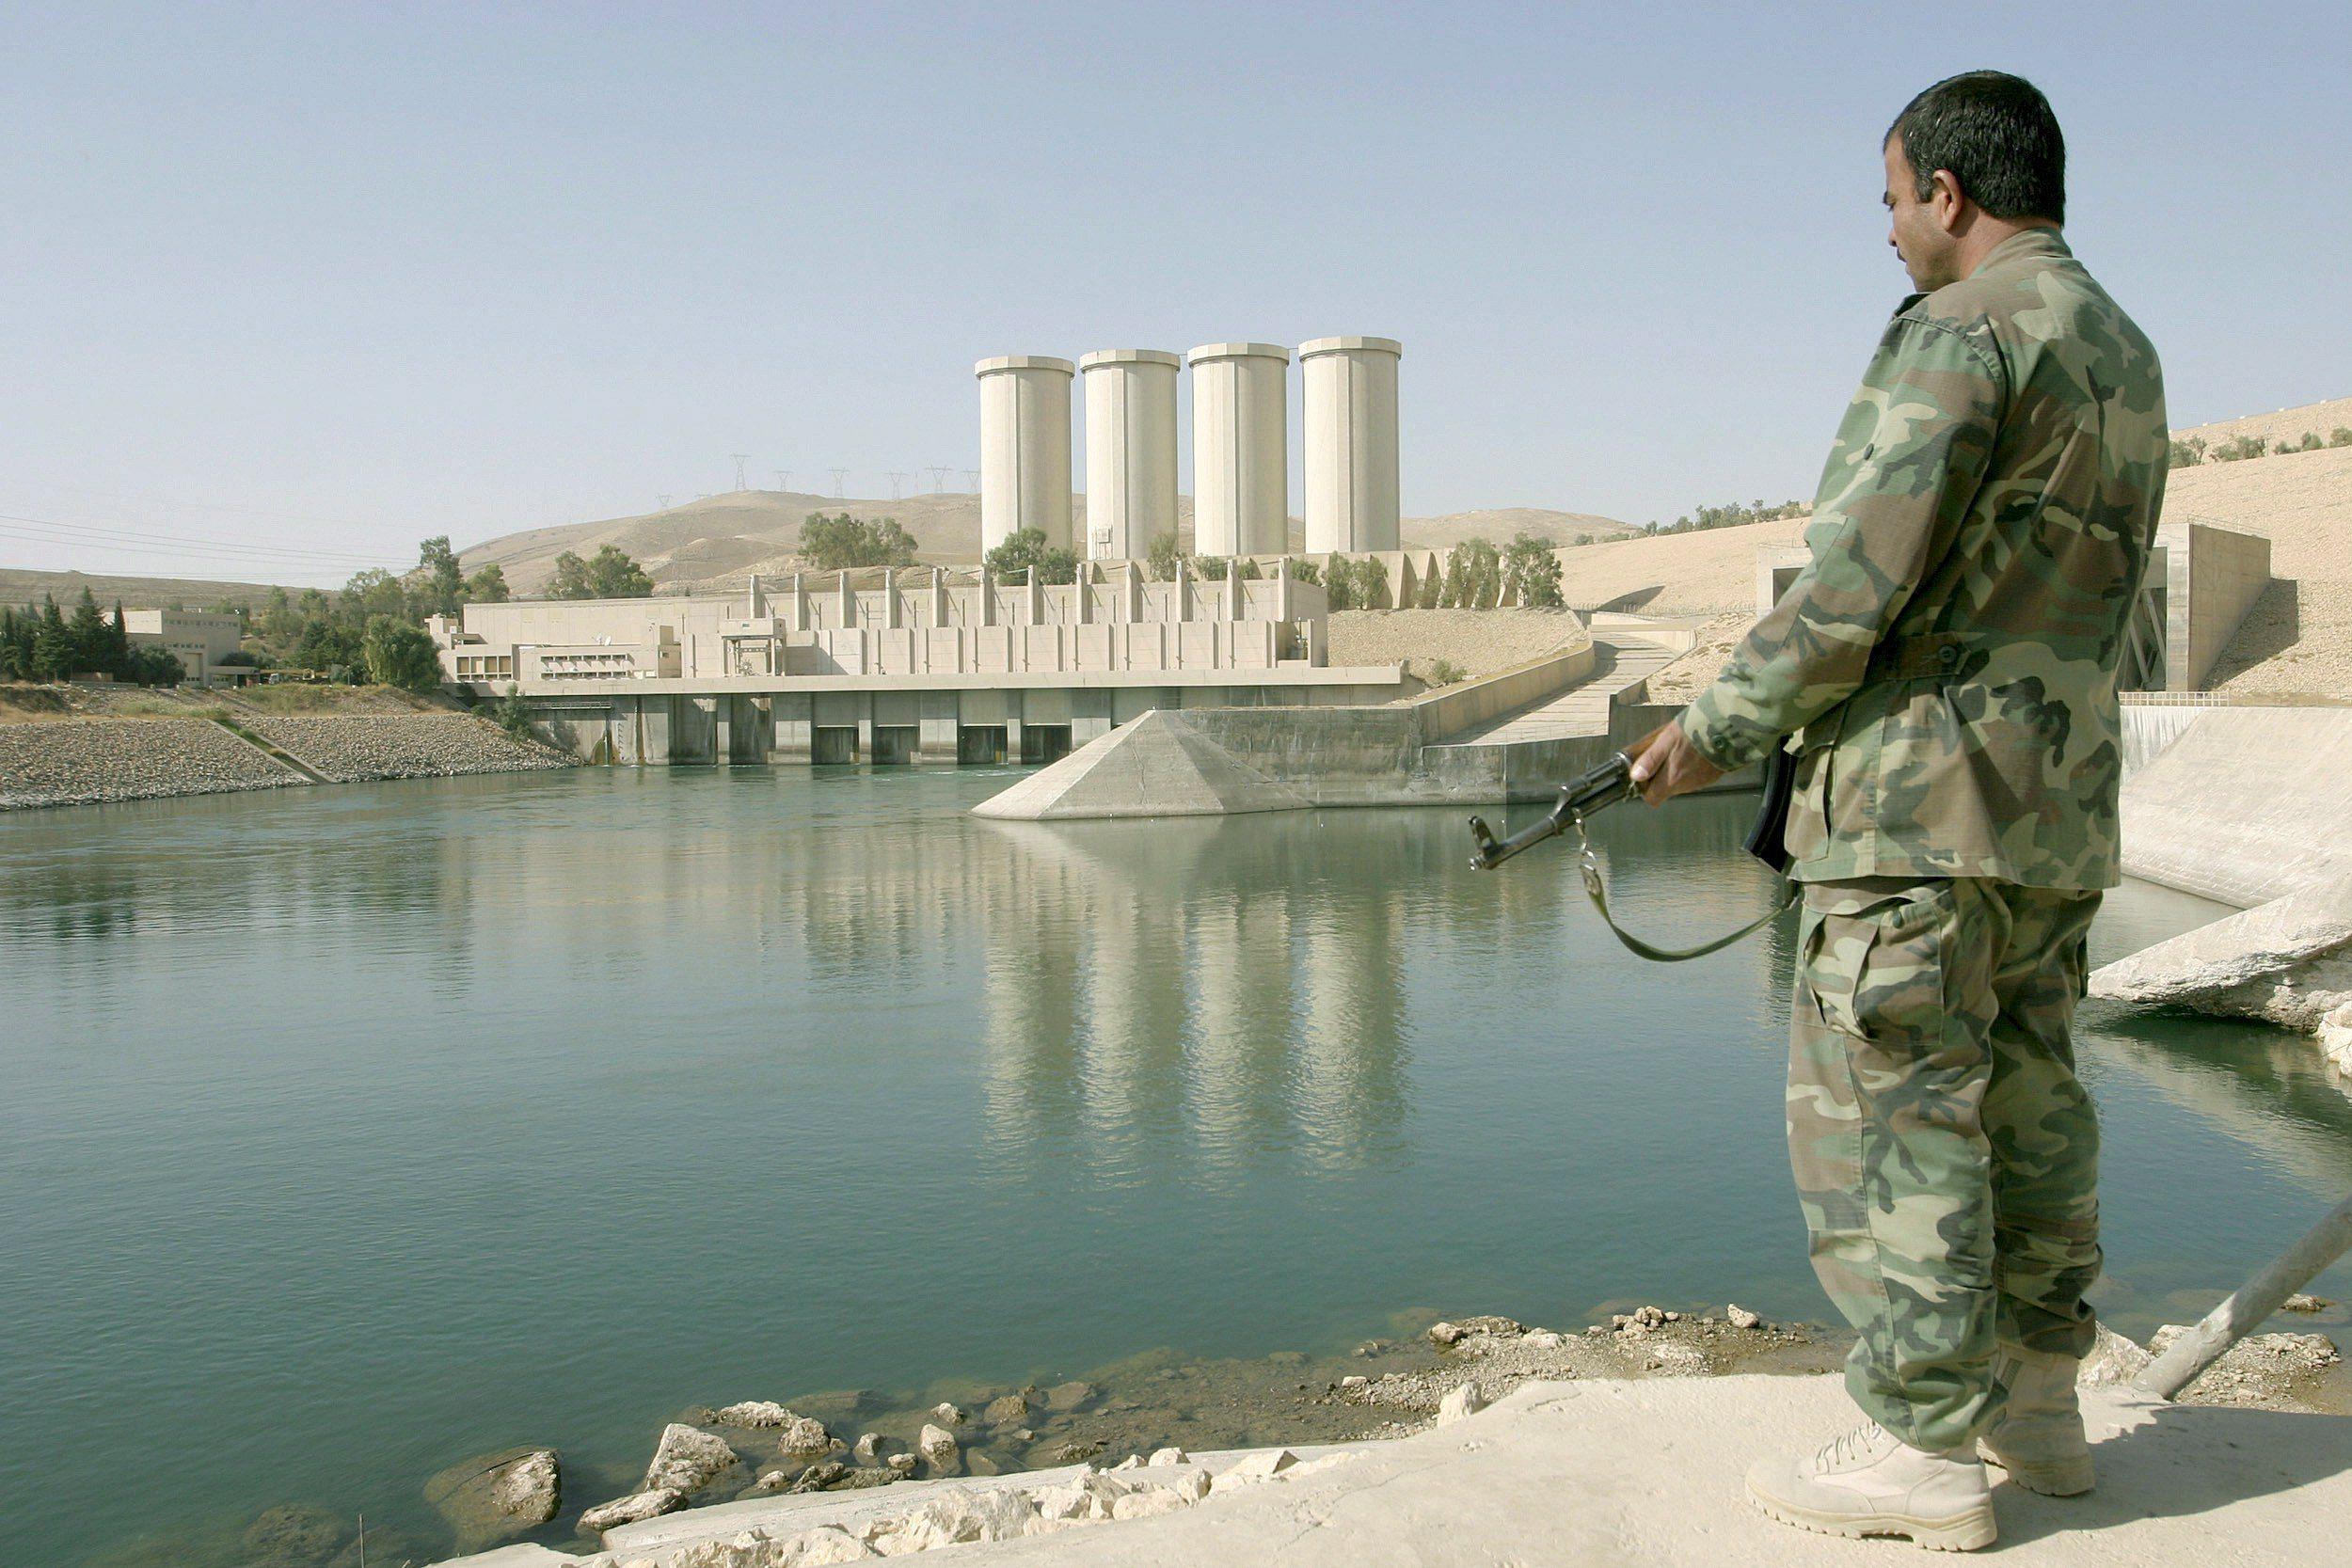 """L'Isis colpirà a Mosul diga e militari italiani"""